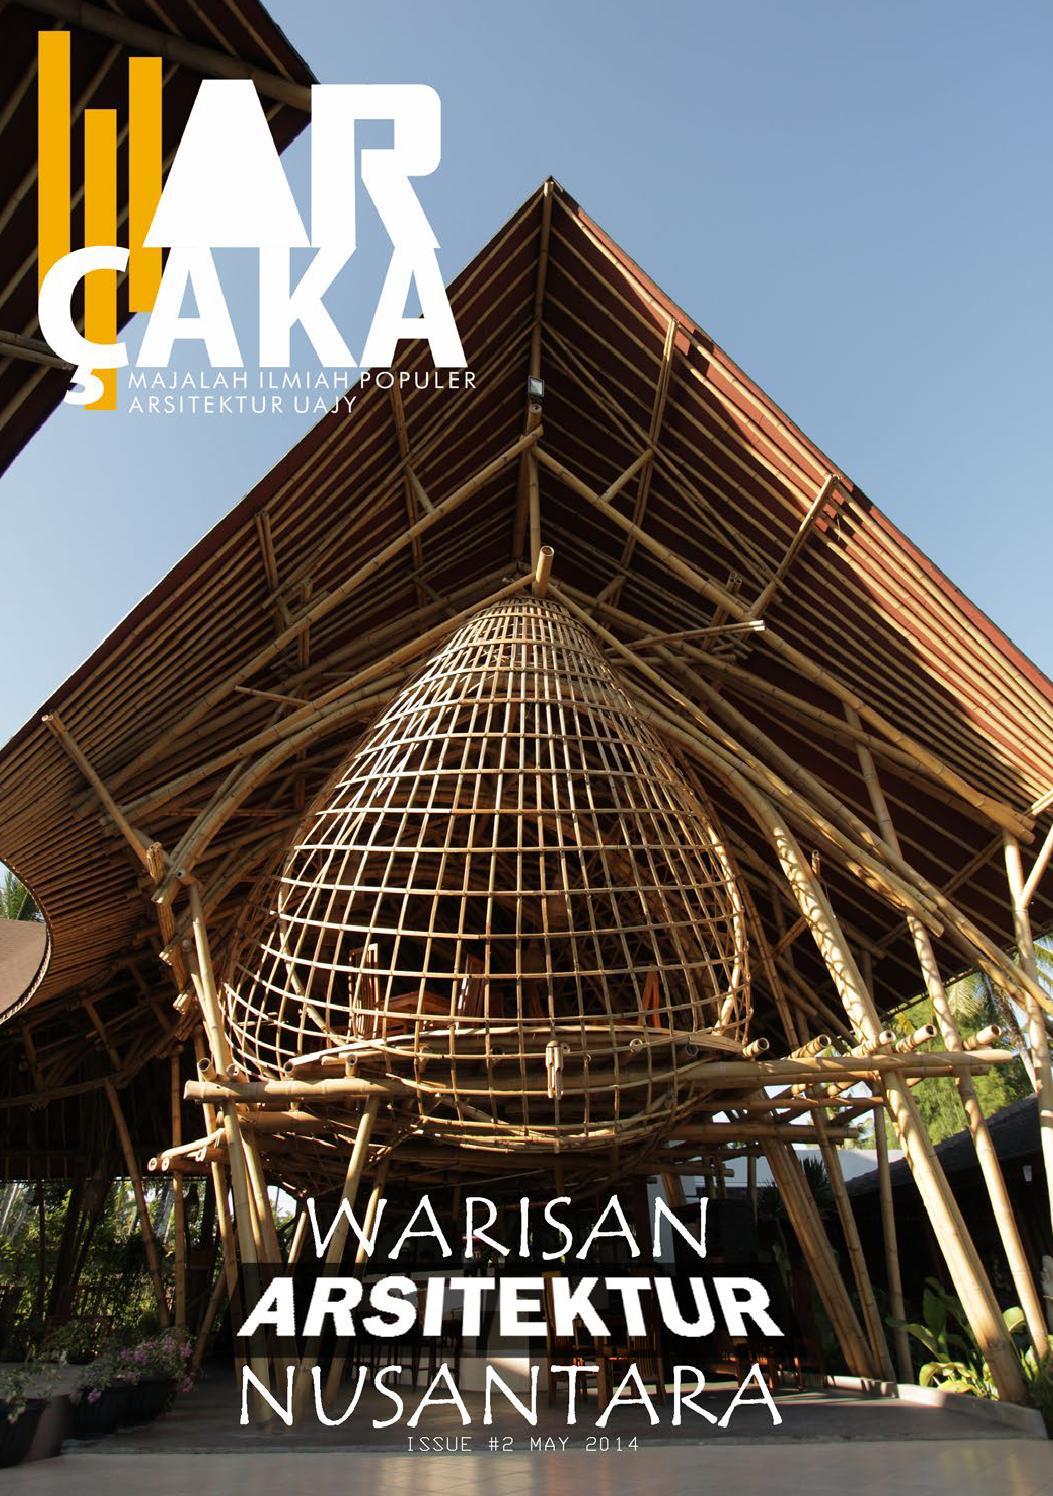 Issue 2 Warisan Arsiektur Nusantara by ARAKA  Issuu